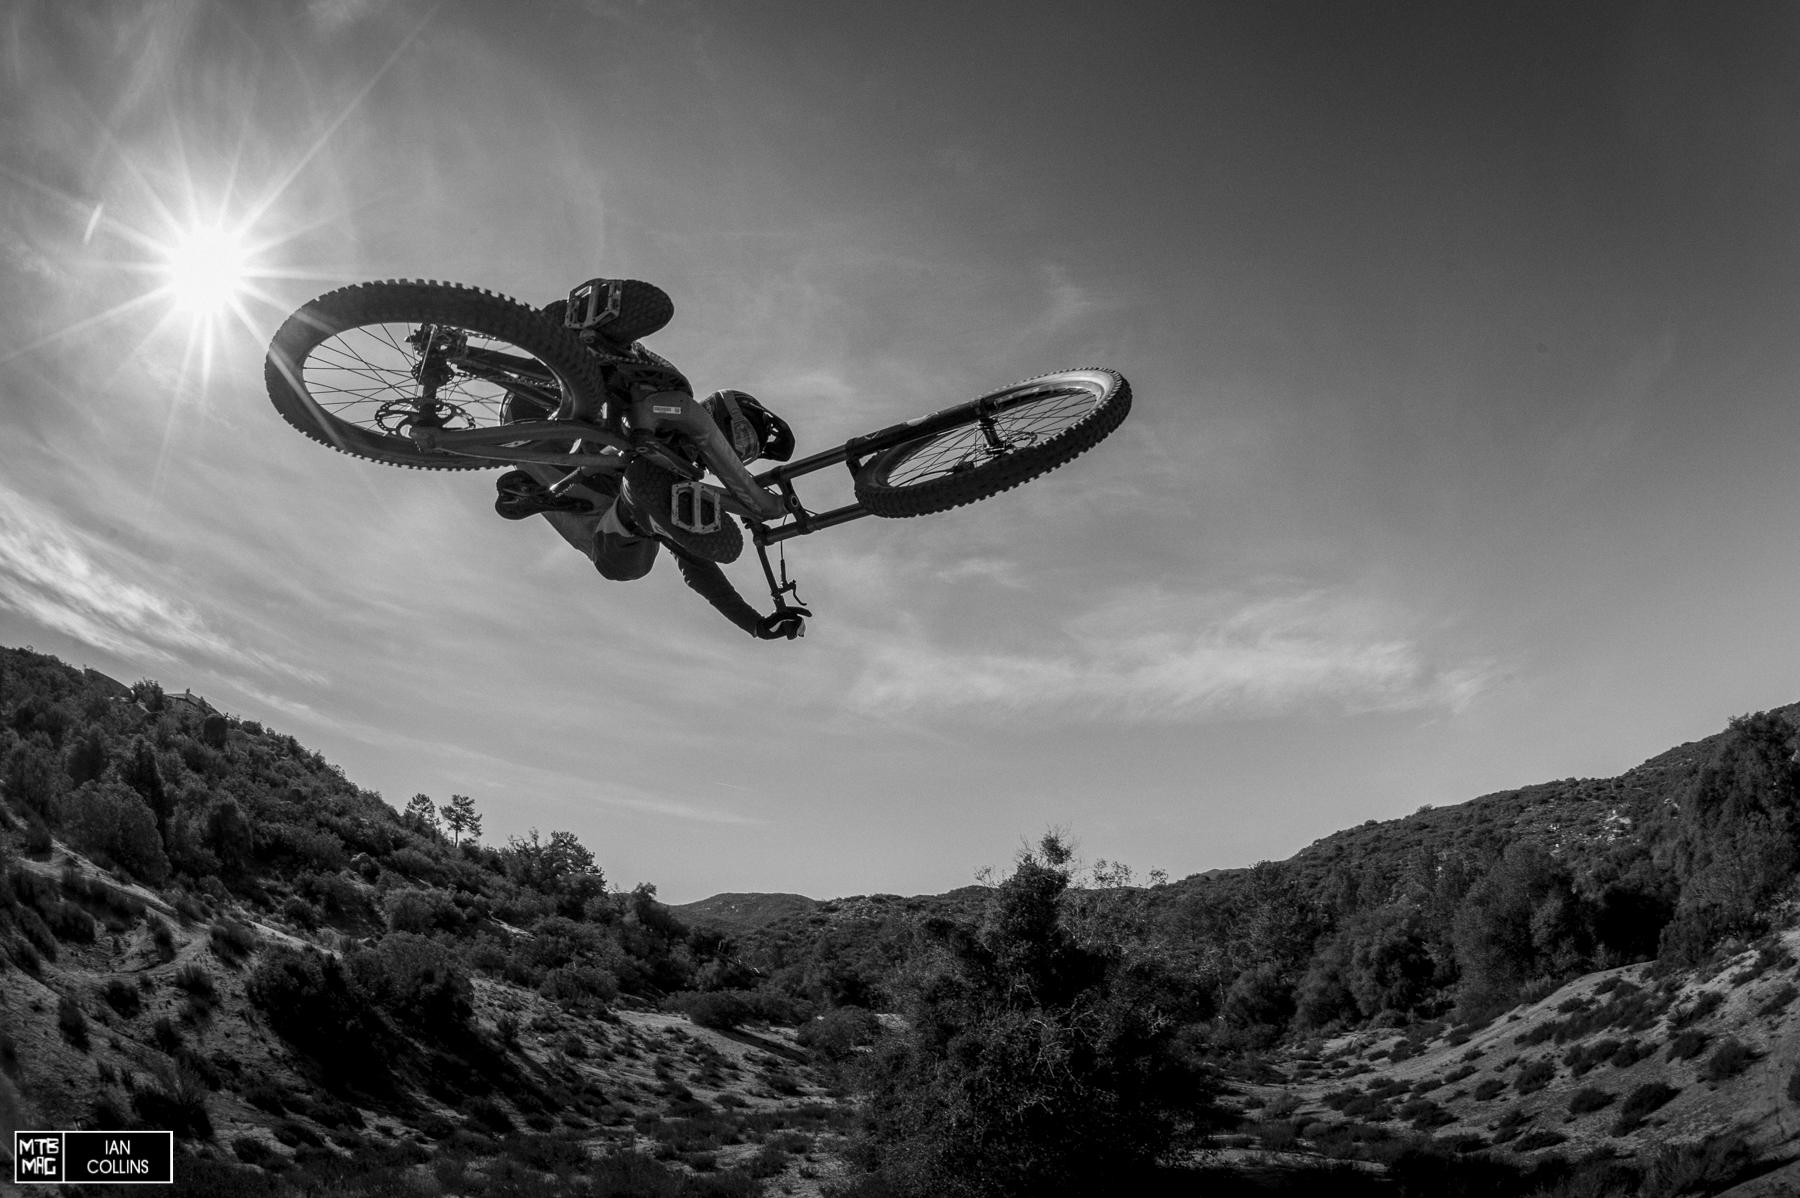 Blasting with Brandon Semenuk and Nico Vink.   So moto.  Pine Valley, 2014